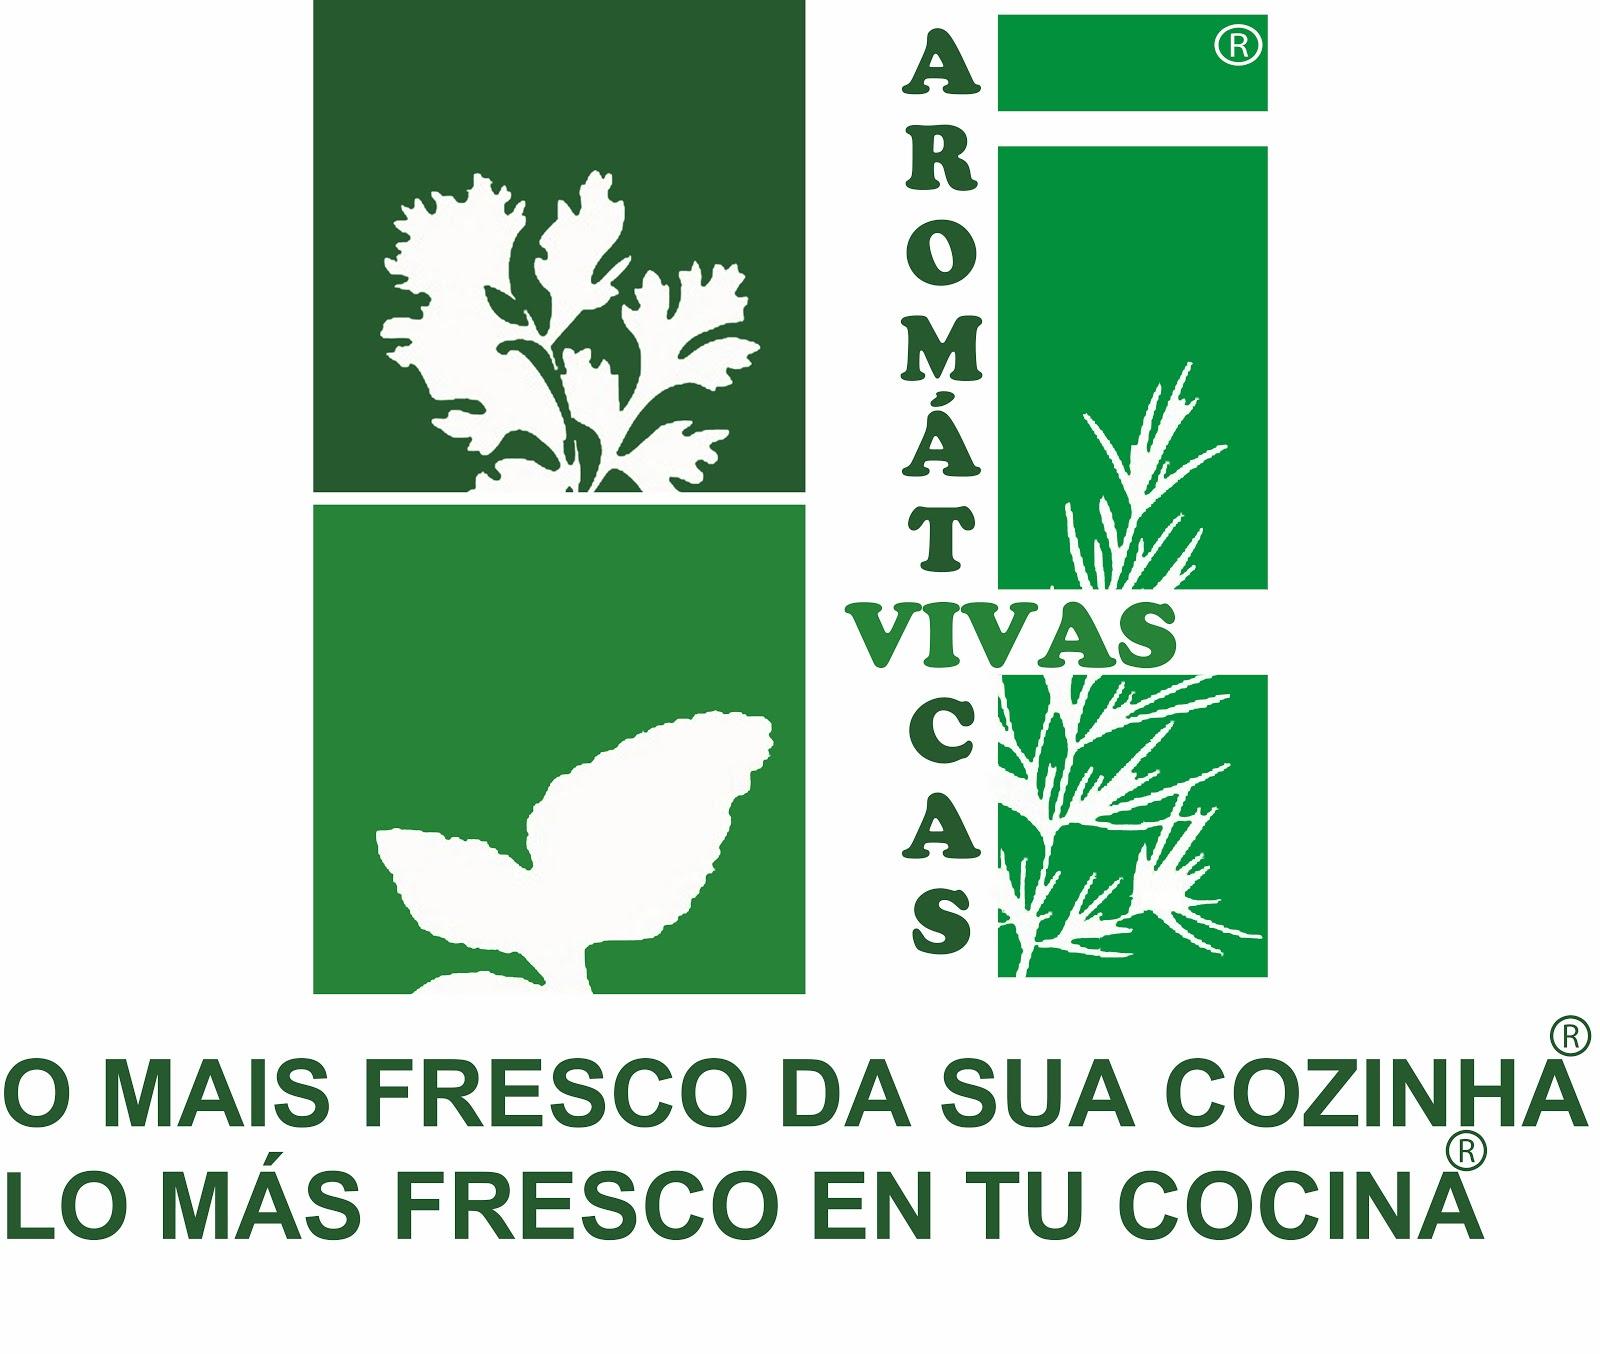 http://www.aromaticasvivas.com/